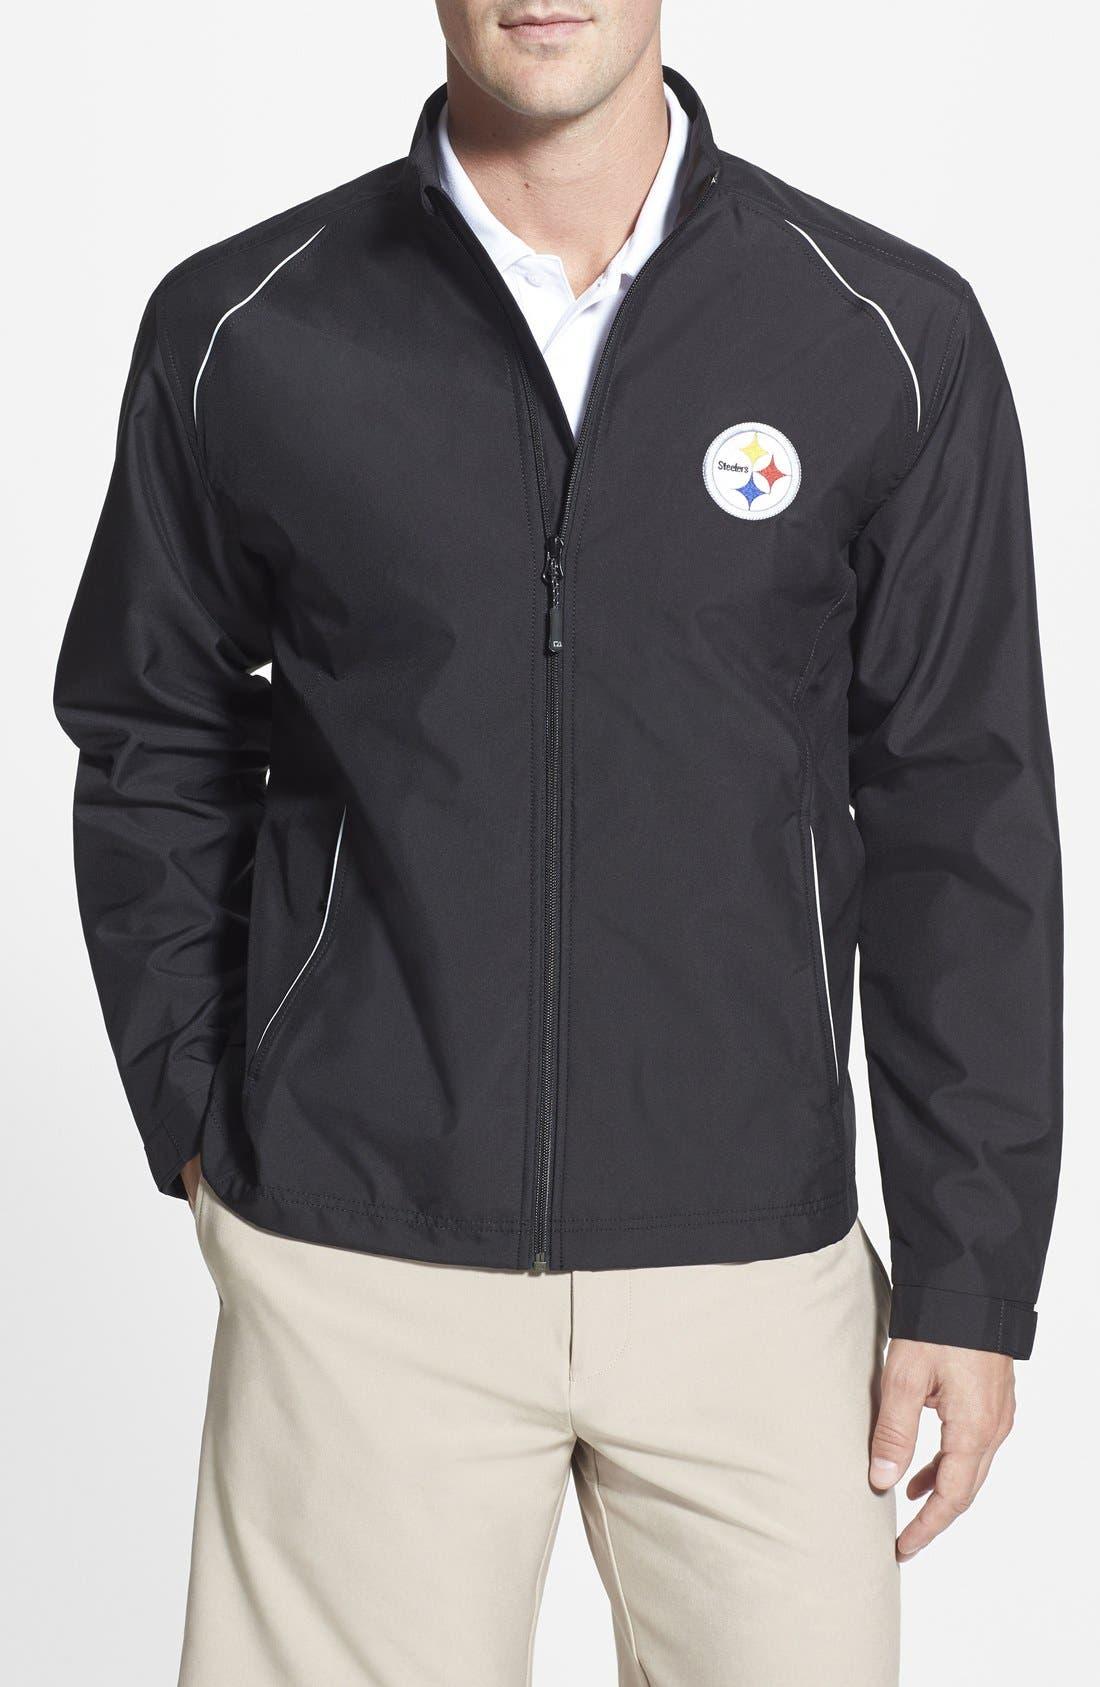 Alternate Image 1 Selected - Cutter & Buck Pittsburgh Steelers - Beacon WeatherTec Wind & Water Resistant Jacket